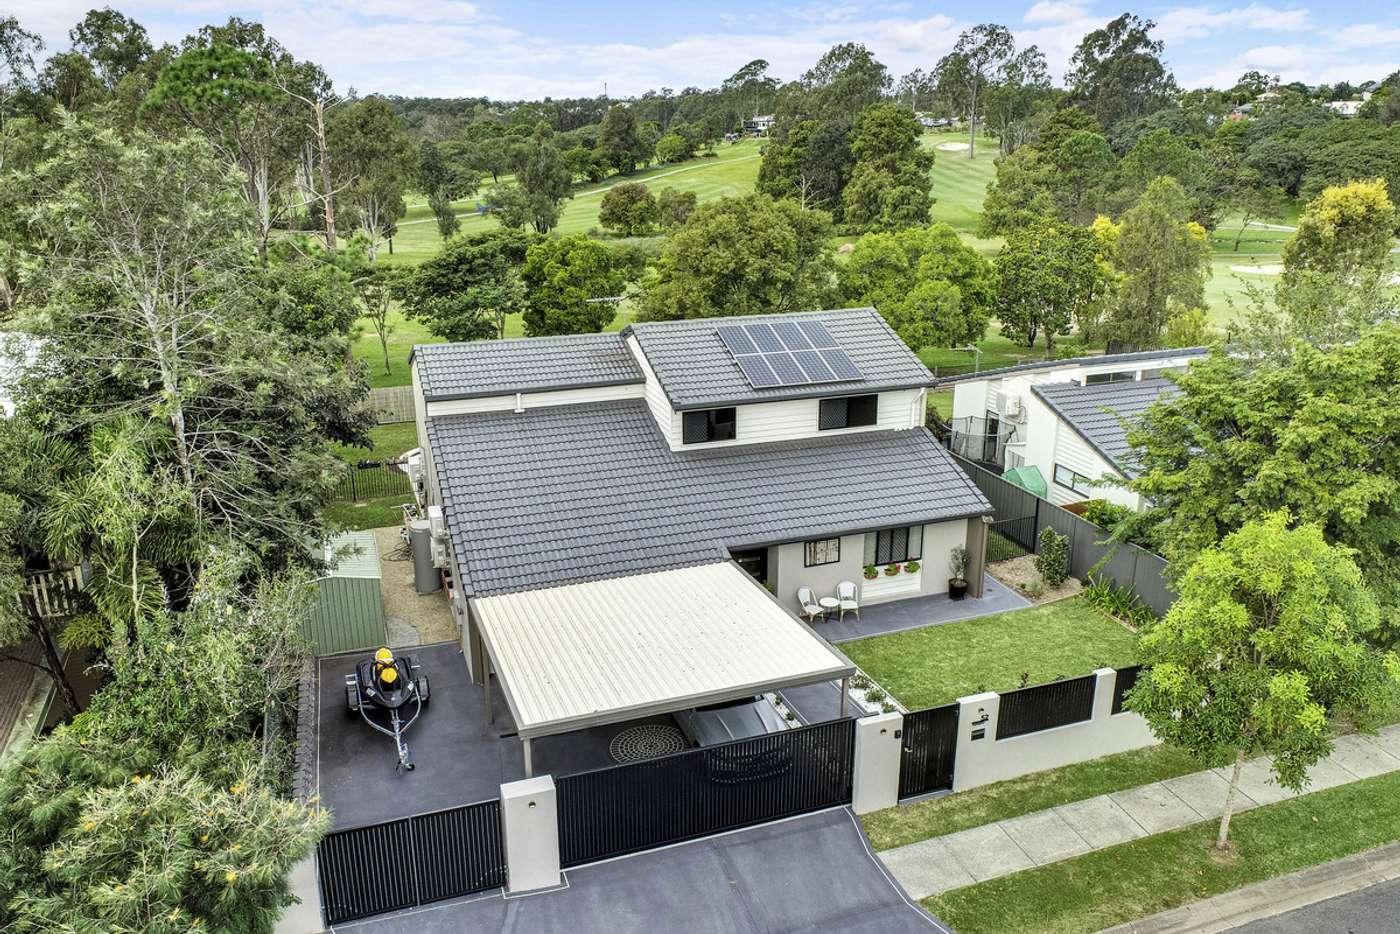 Main view of Homely house listing, 52 Tekapo Street, Westlake QLD 4074